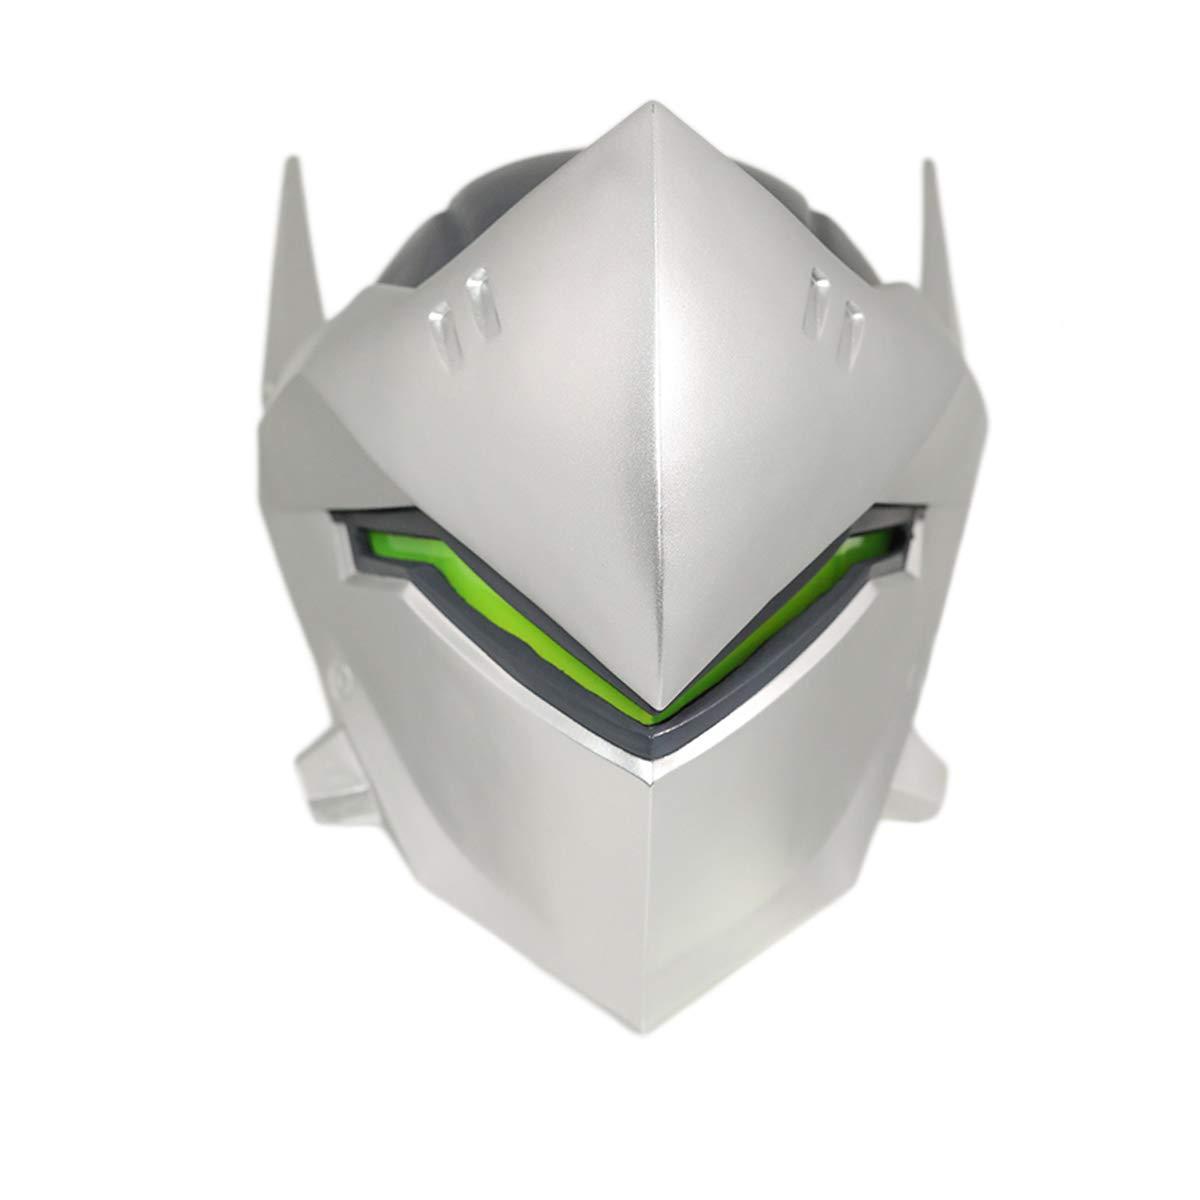 Overwatch Genji Mask Knight Genji Wearable Cosplay Helmet Game Anime Costume Accessory Prop Silver